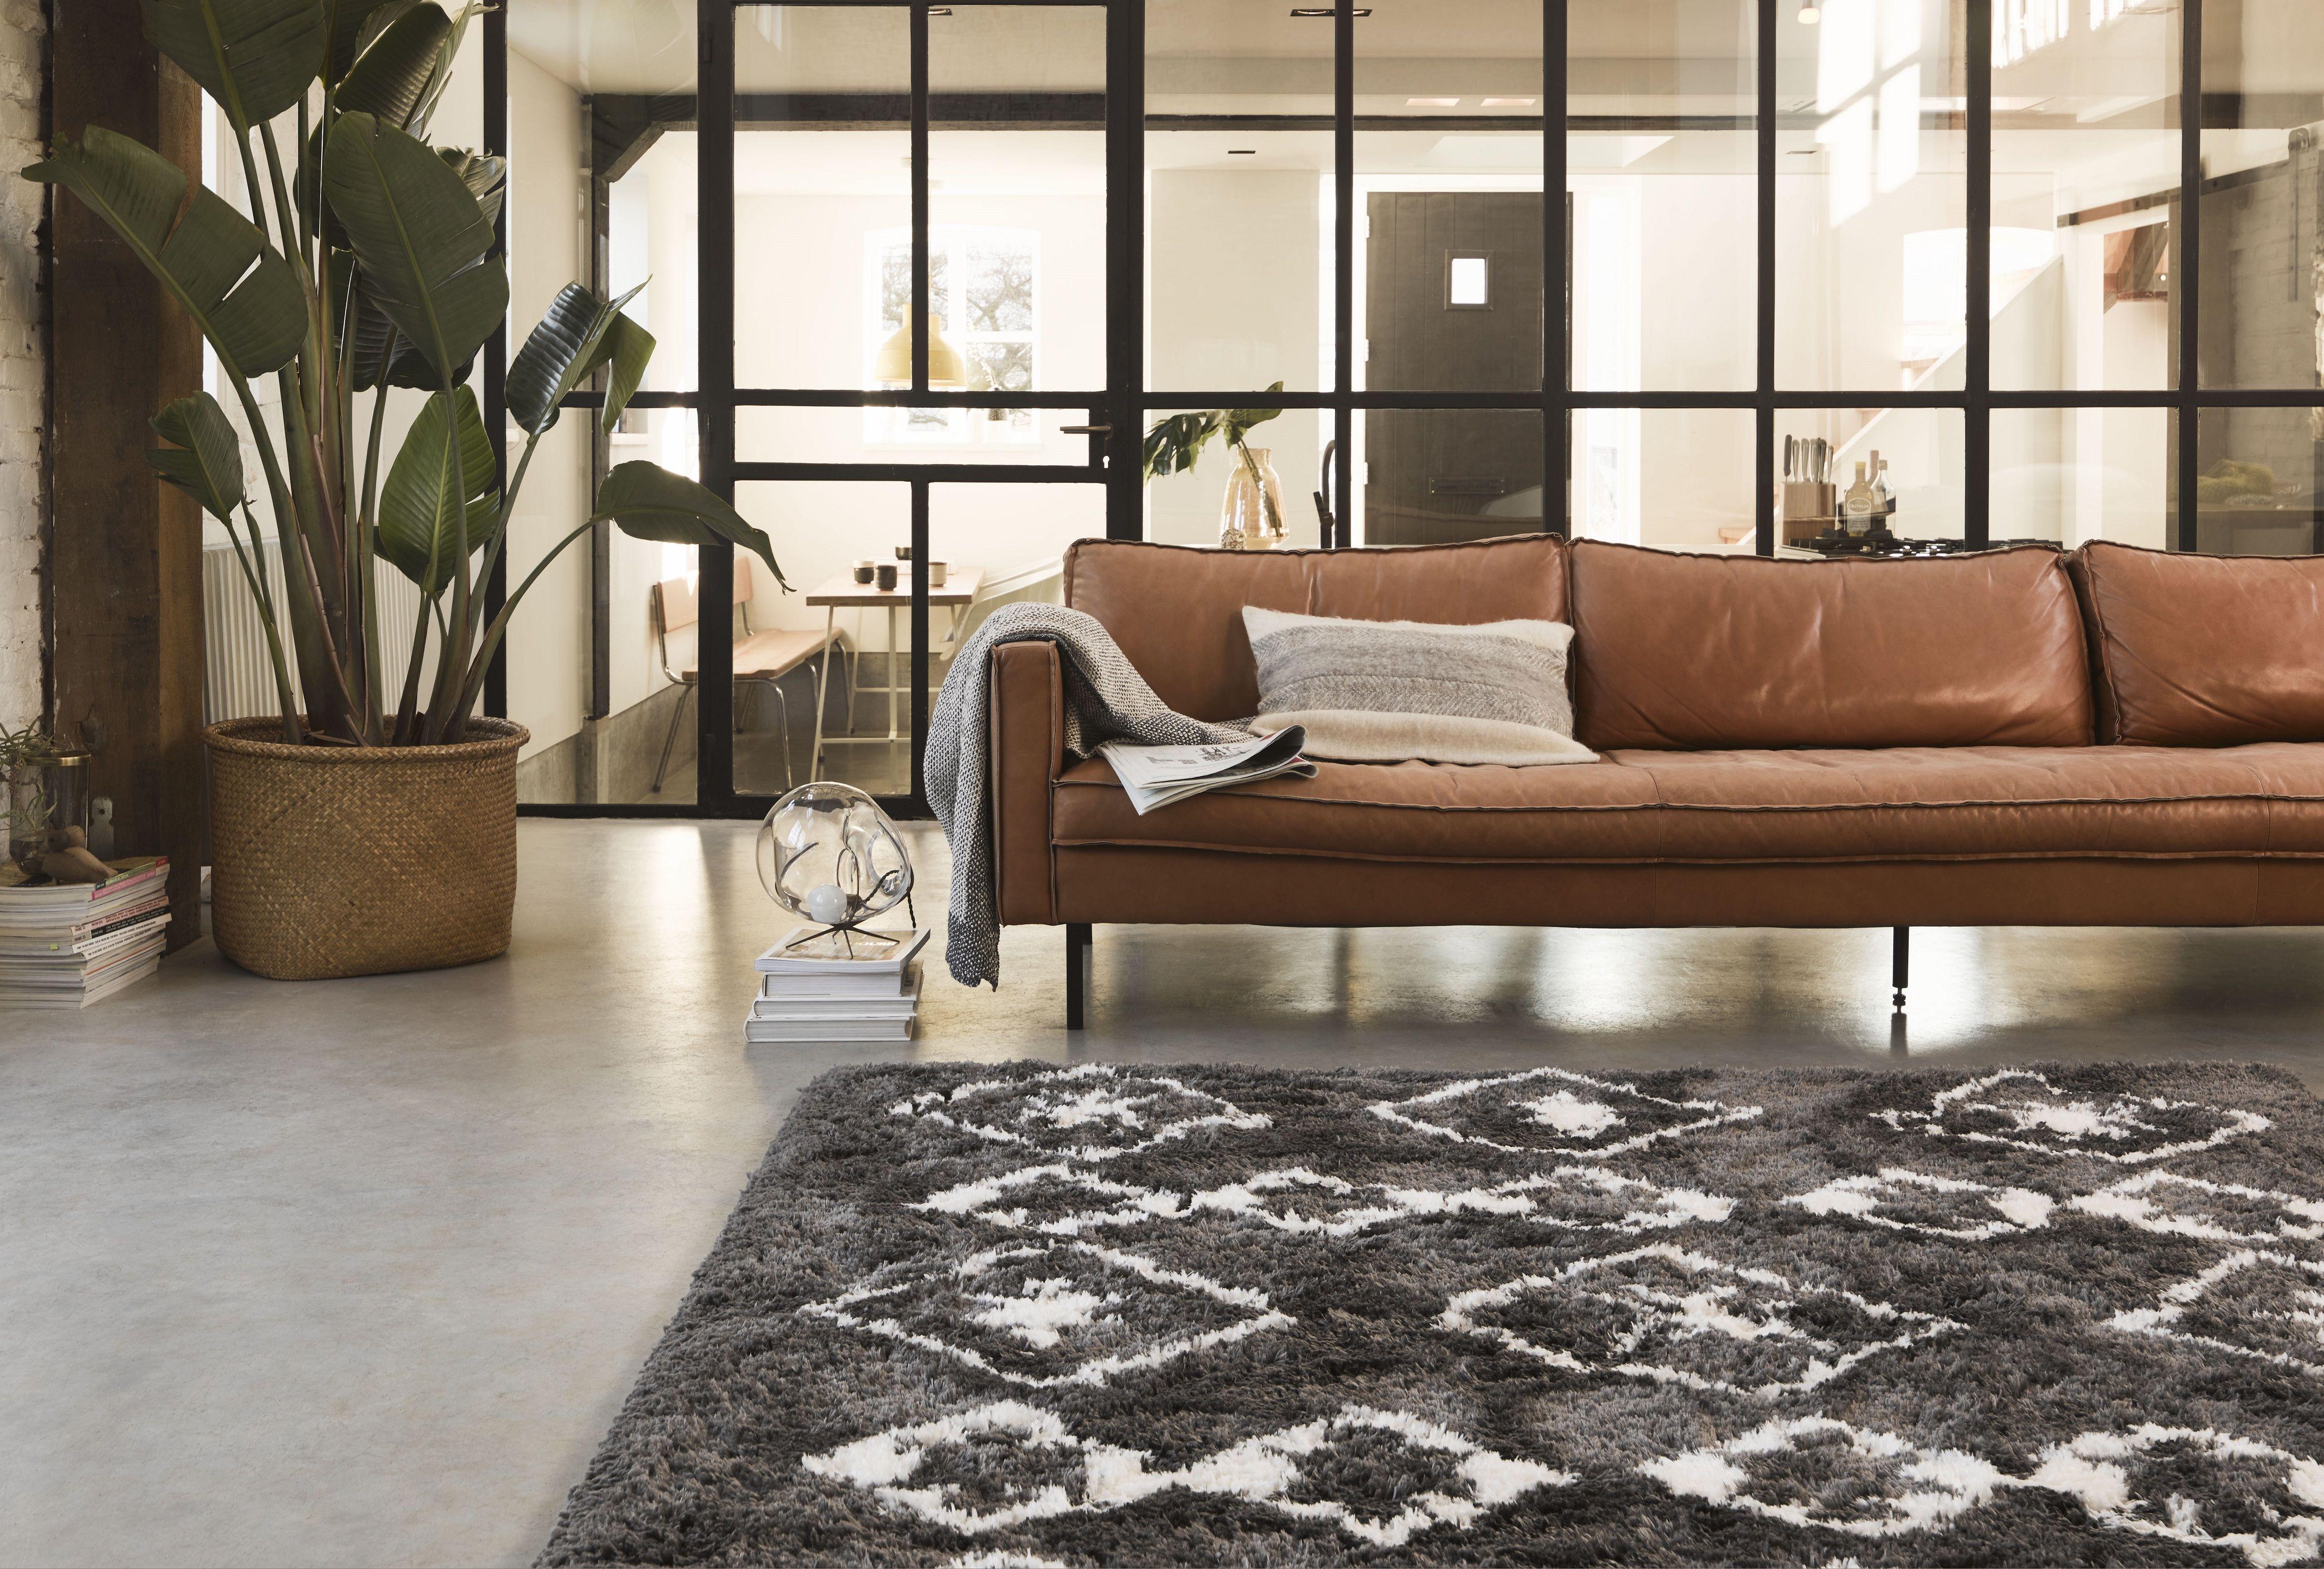 Teppich Grau Hochflor Boho Scandic Ayachi Wecon Home Sofa Design Hochflor Teppich Teppicharten